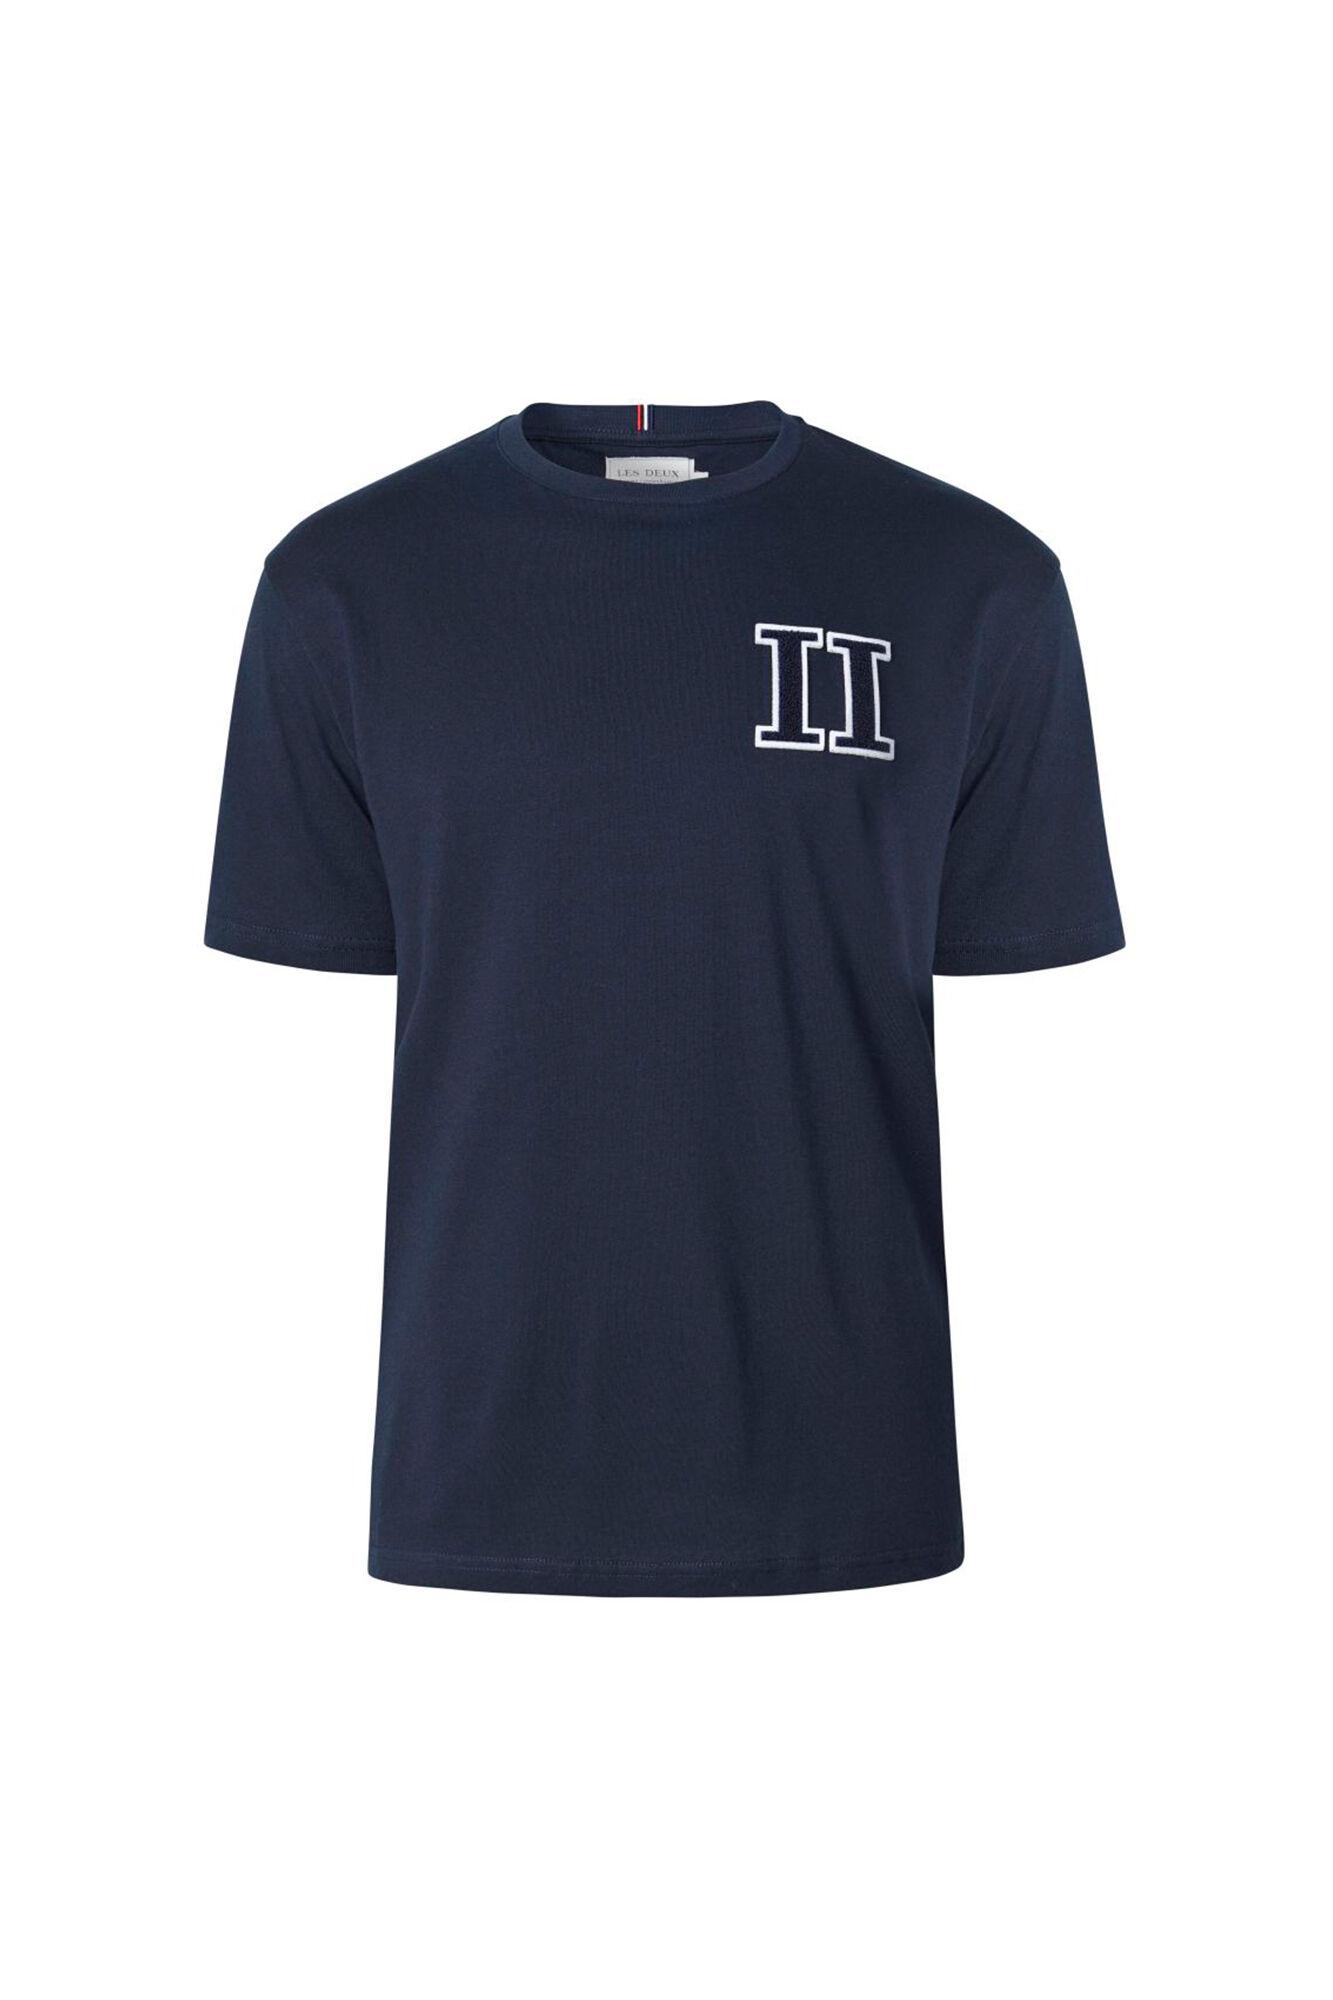 Leperie T-shirt LDM101029, DARK NAVY